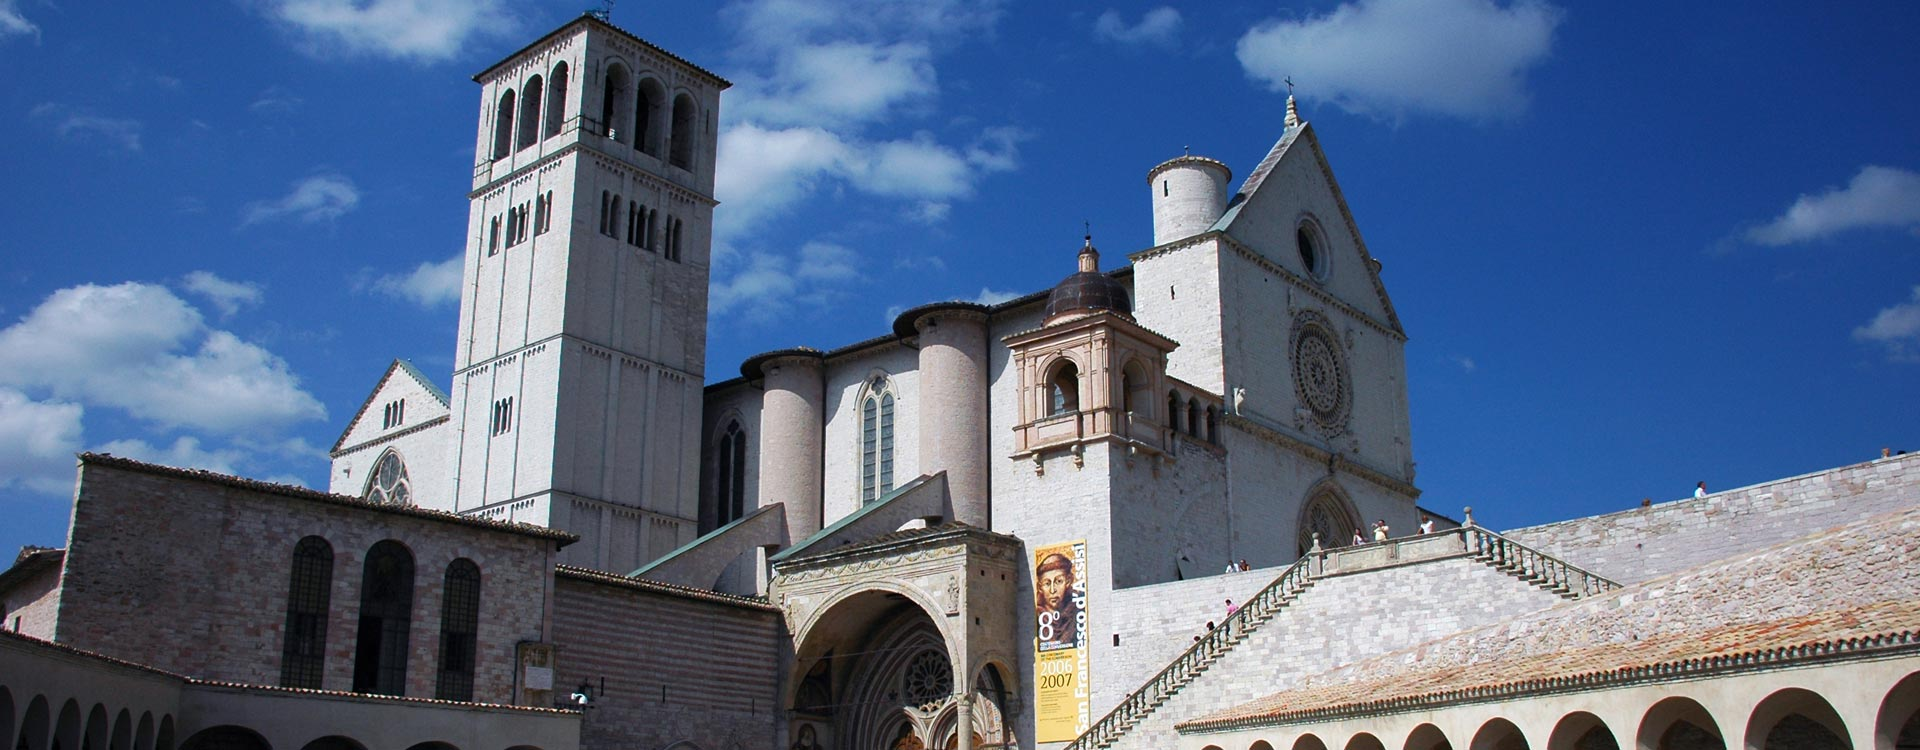 Agriturismo Assisi 'Relais Parco del Subasio' - A 5 minuti dalla città di Assisi